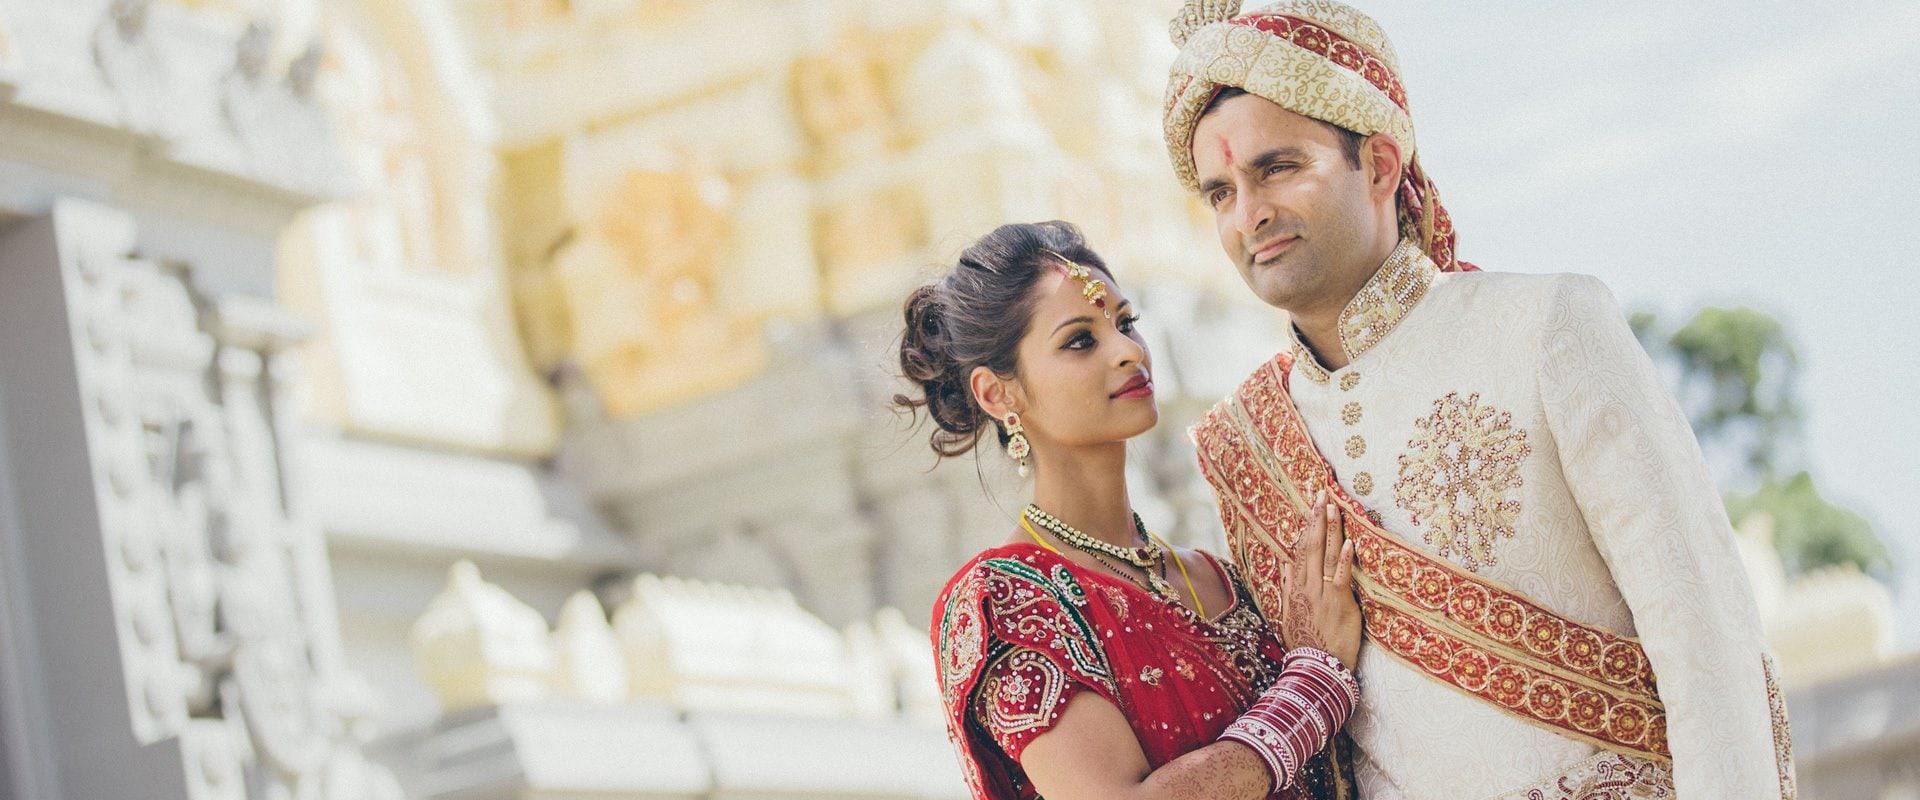 melbourne indian weddings